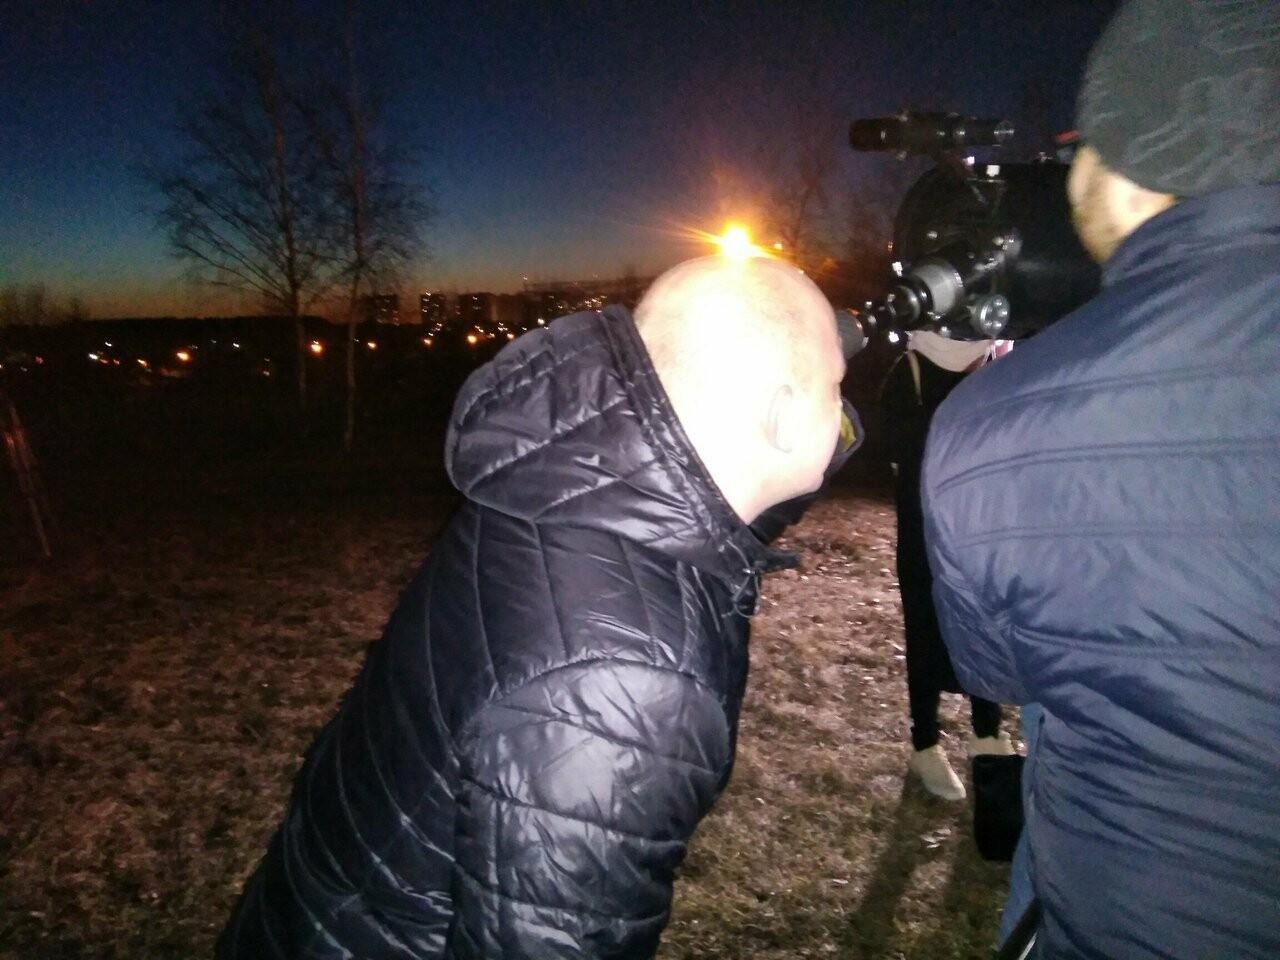 Тамбовские звездочеты получили космические подарки от Go68 и «Радио Дача», фото-4